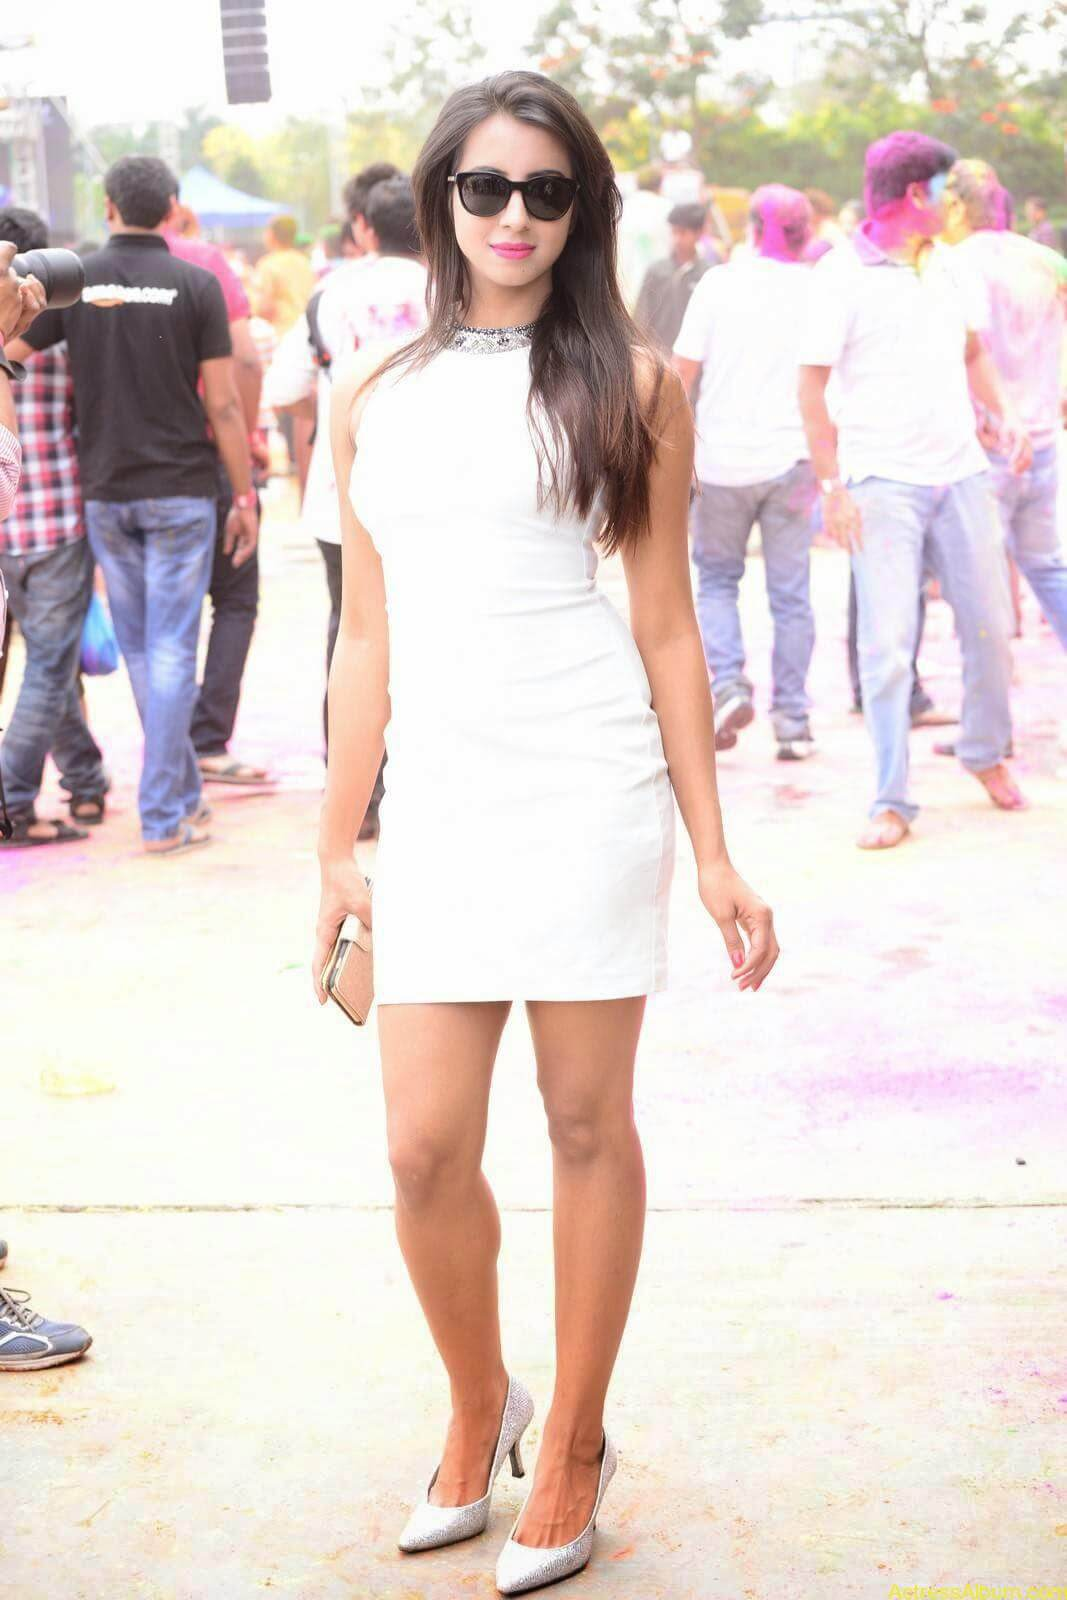 Sanjjanaa-in-White-Shorts-at-Holi-Party-10